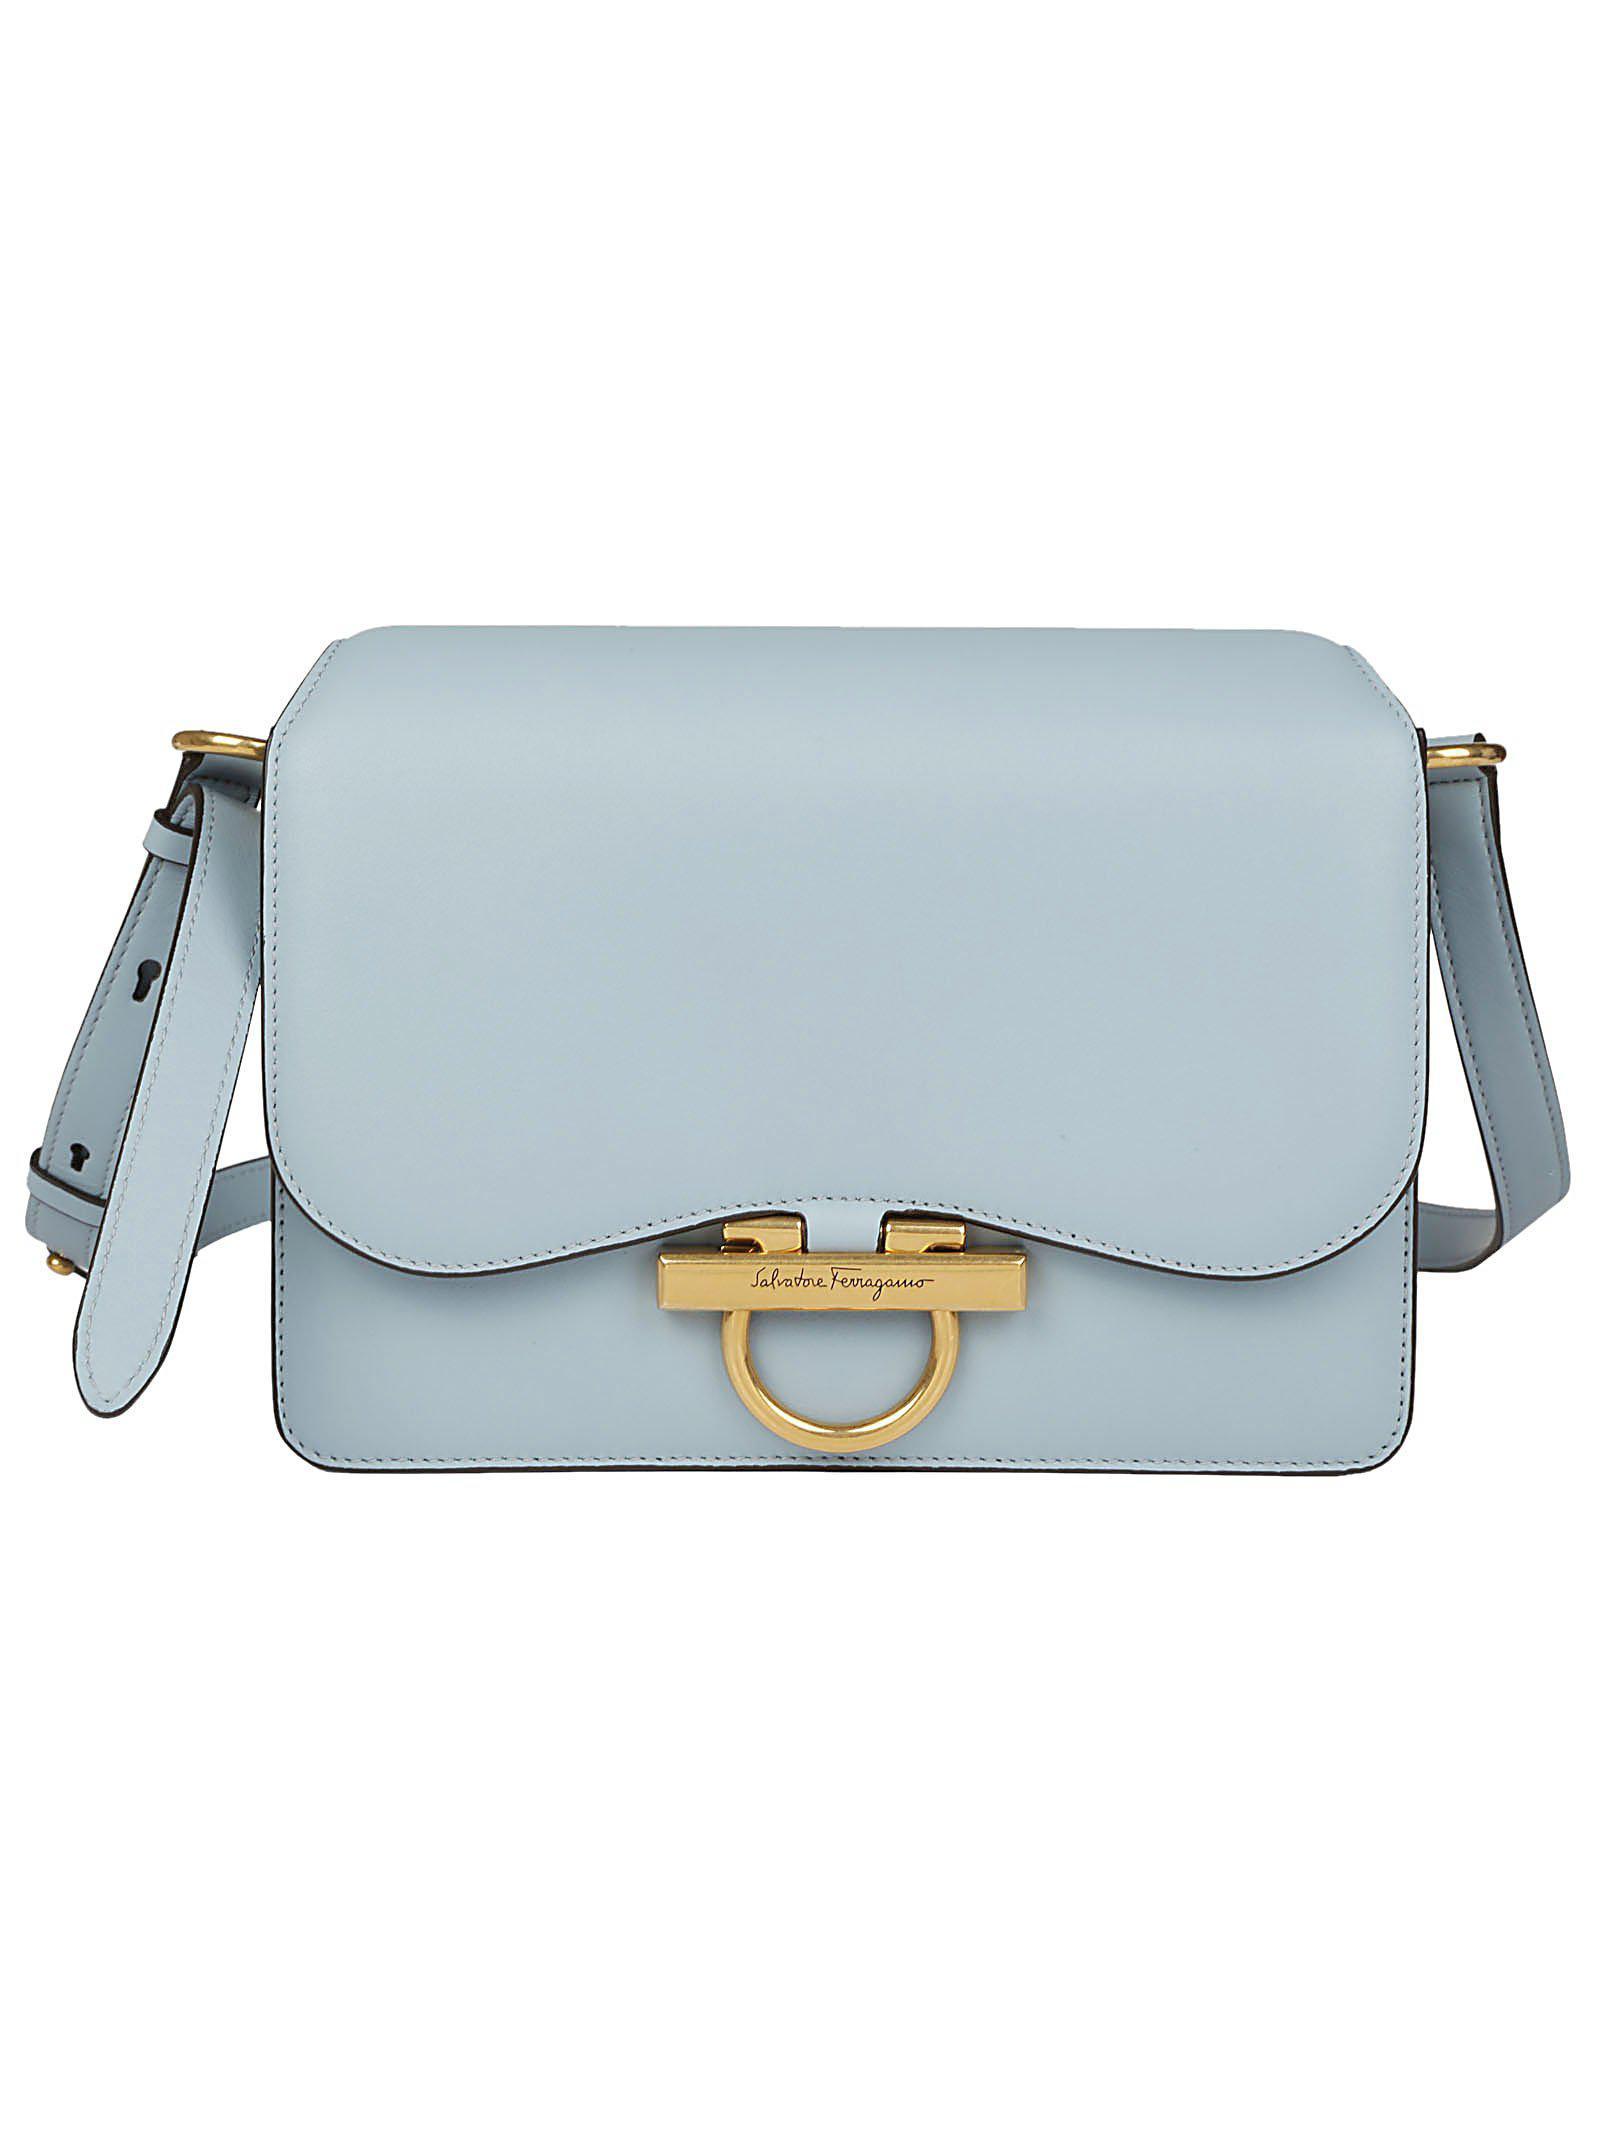 a98a34fc1239 Ferragamo Logo Clasp Shoulder Bag in Blue - Lyst